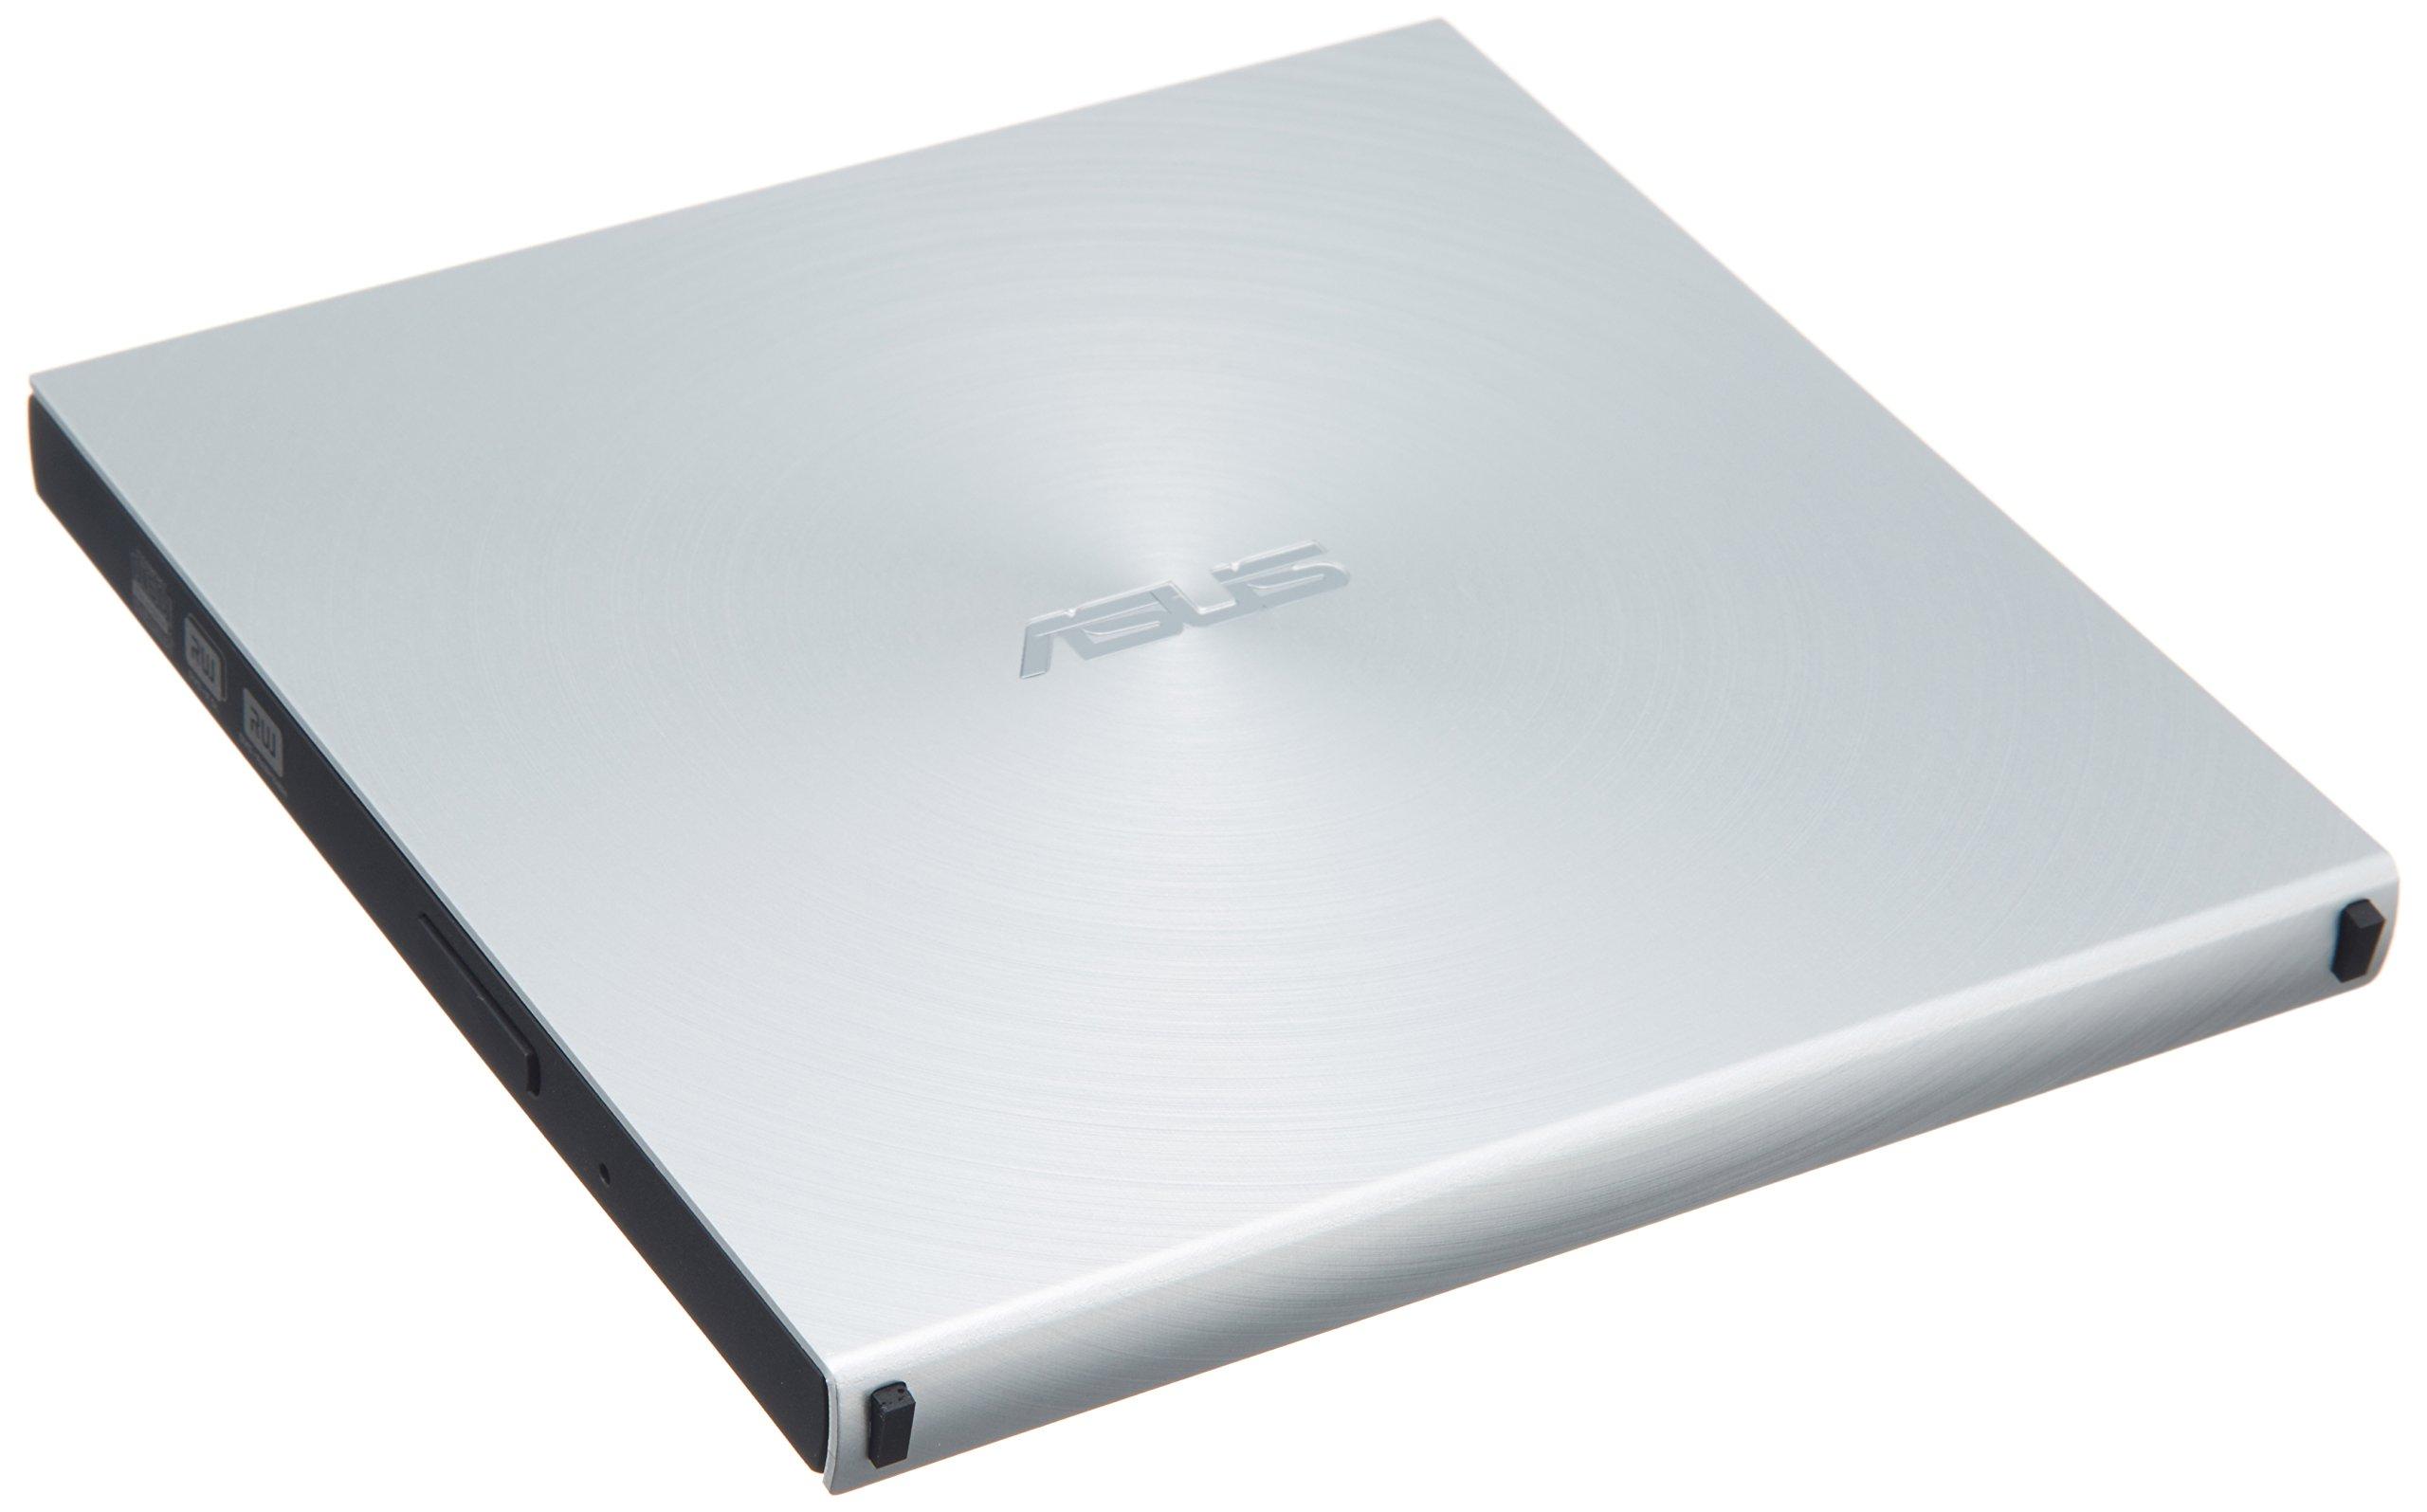 ASUS Computer International Direct Optical Drives SDRW-08U5S-U/SIL/G/AS